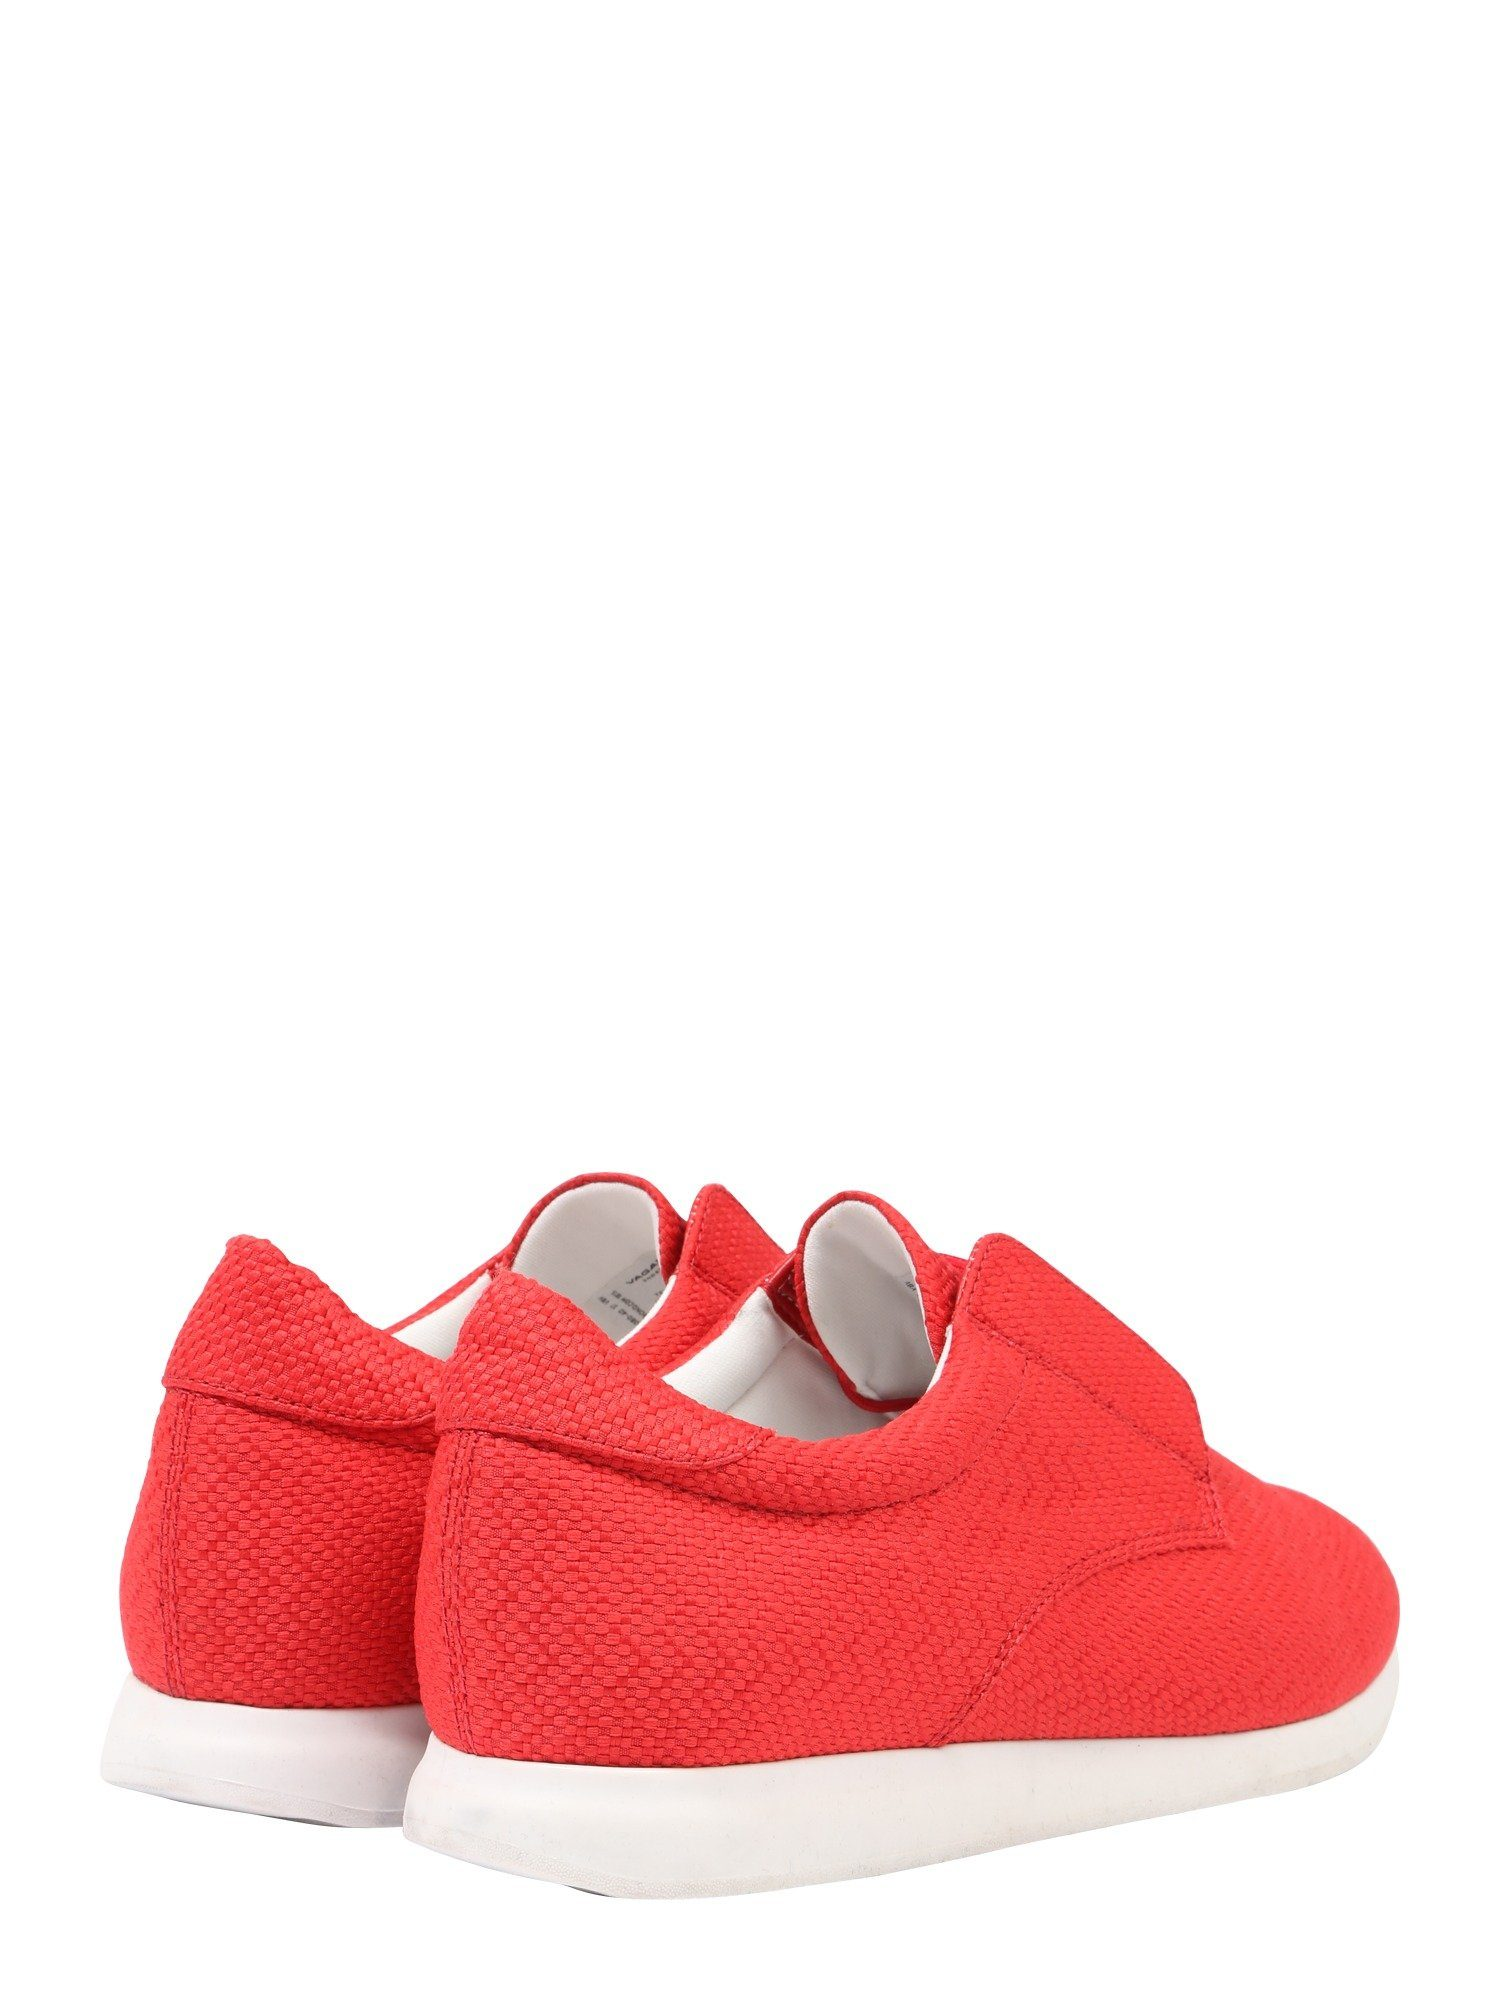 Vagabond Kasai Sneaker, Ziernaht online kaufen  rot